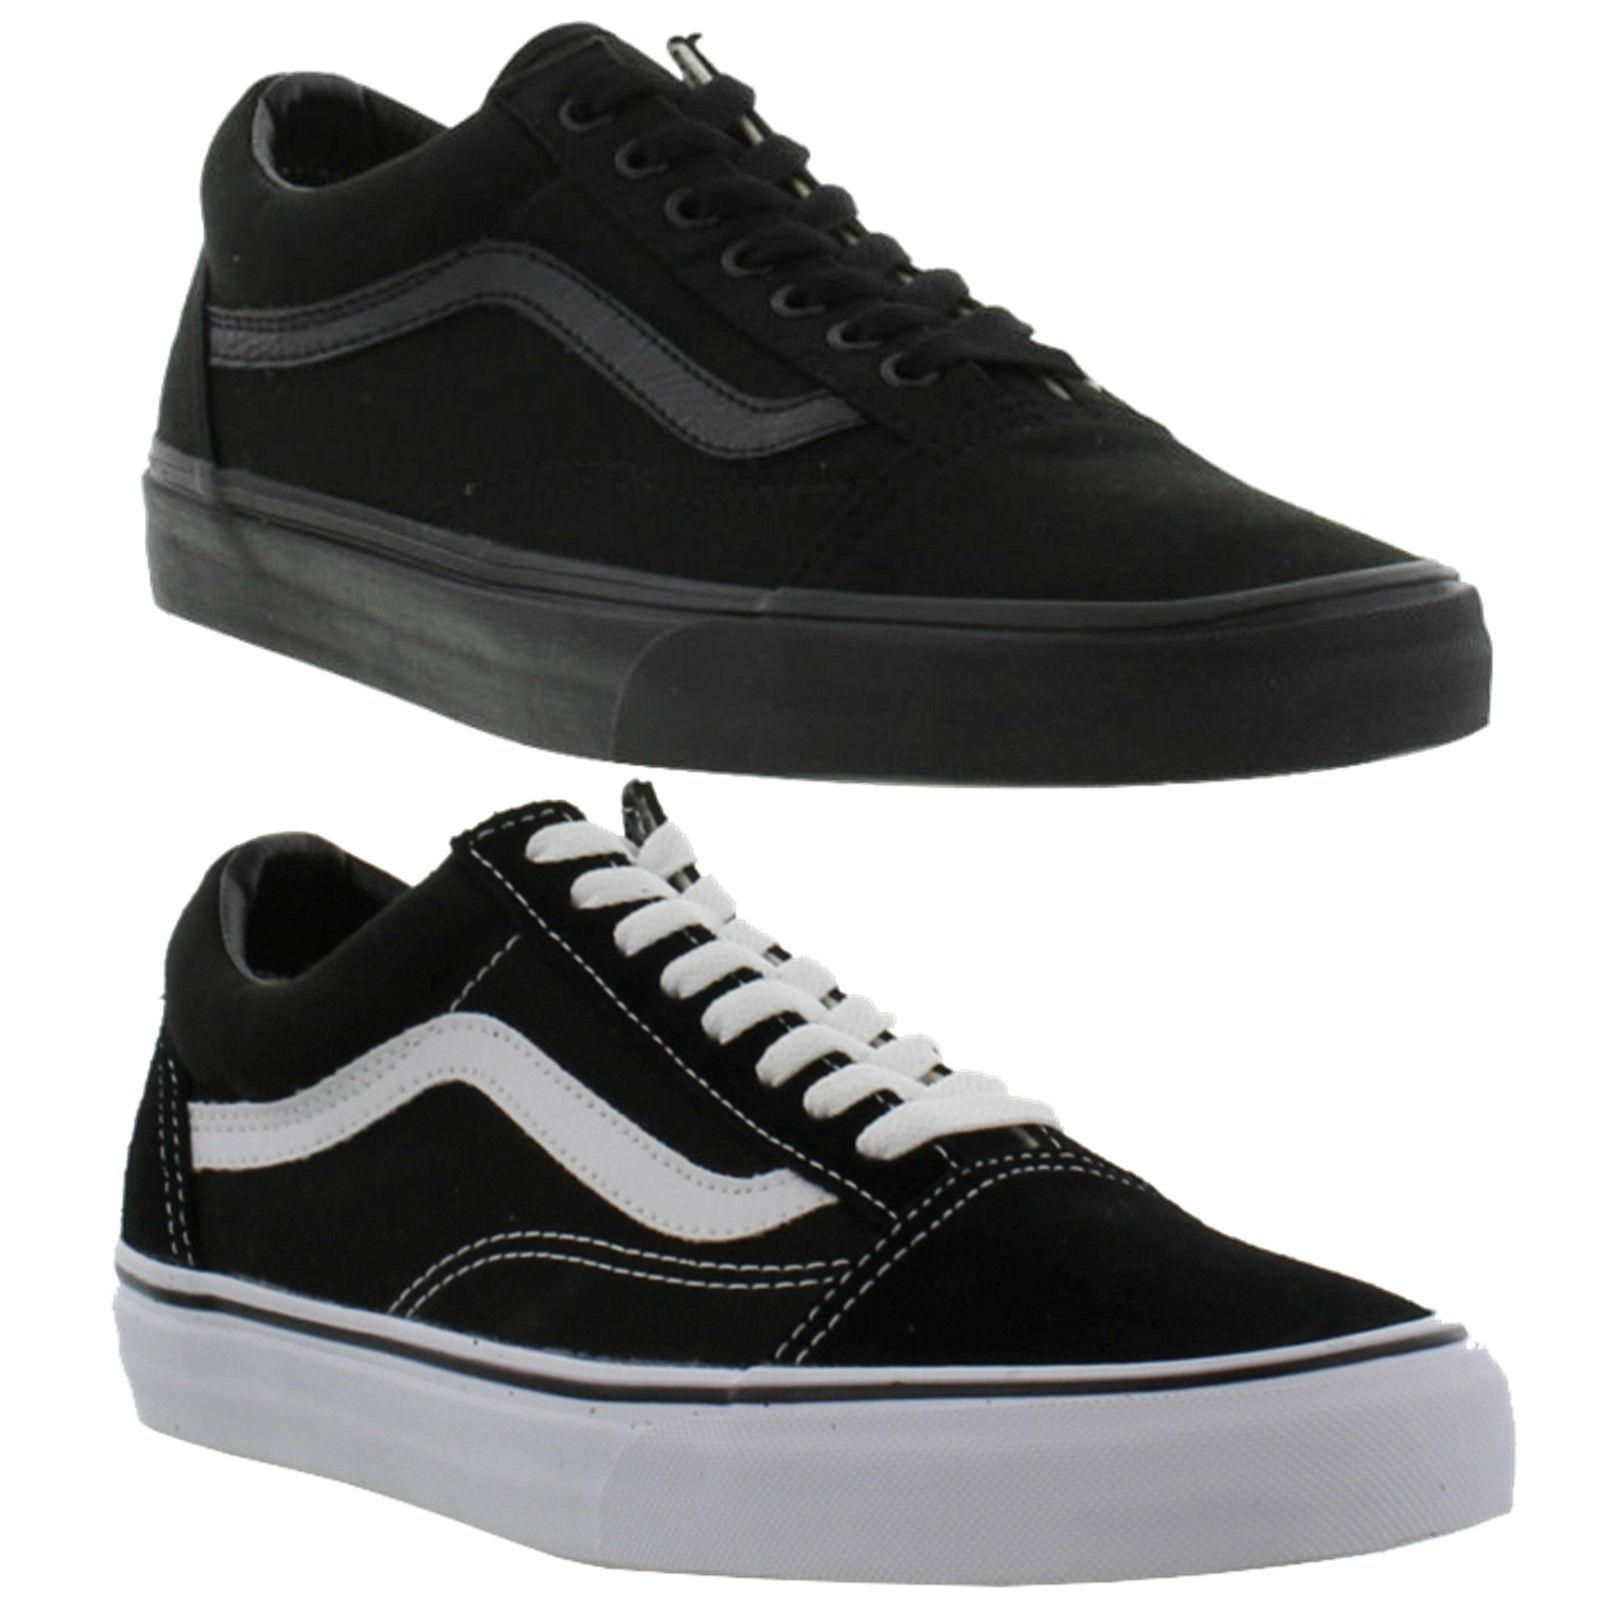 Aetrex Womens Shoes Ebay Size